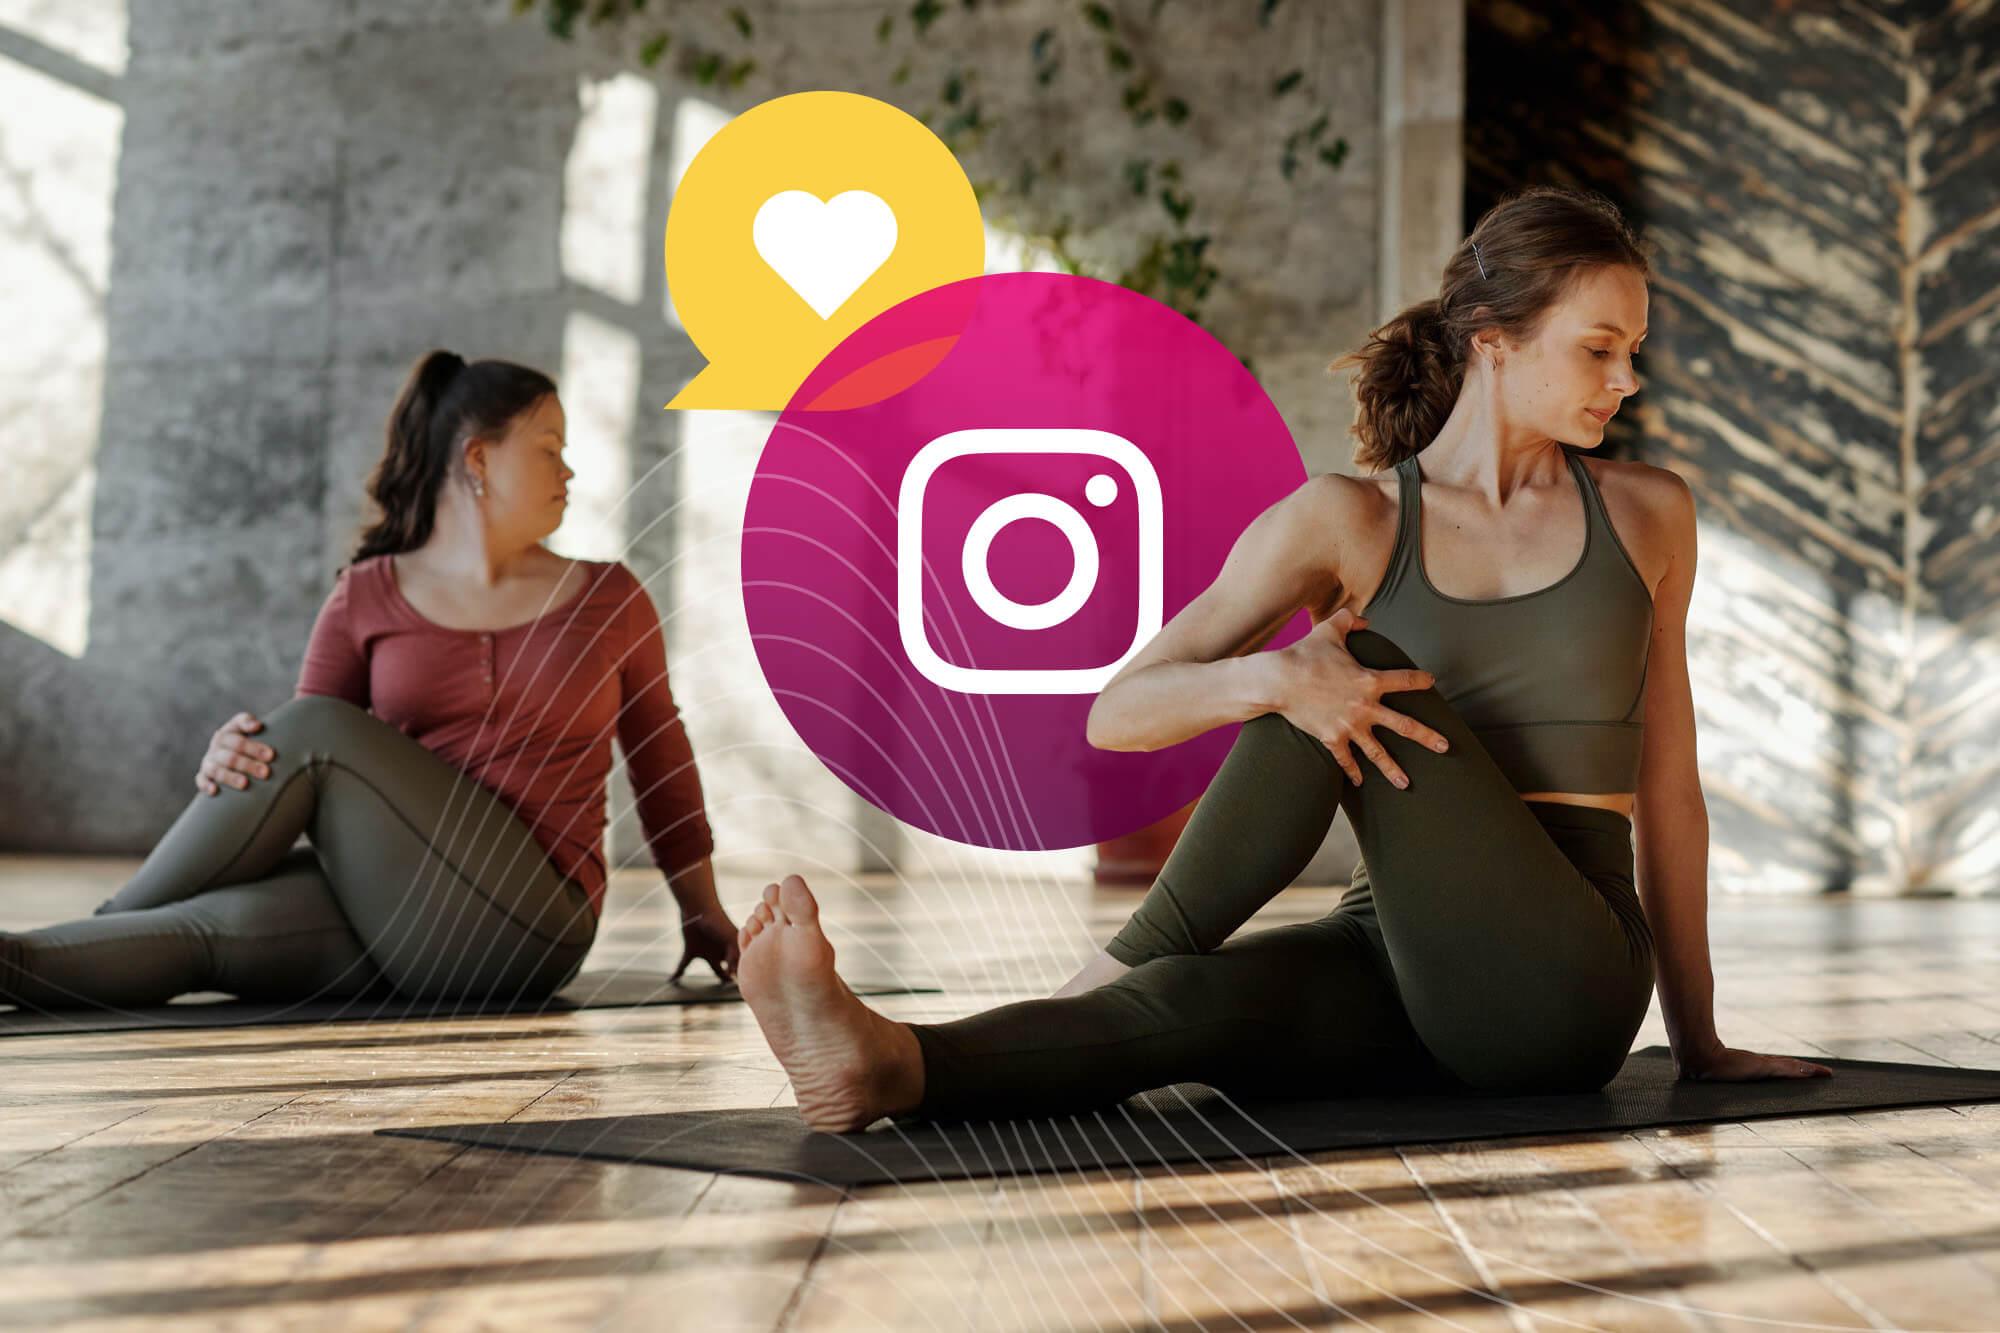 Wellness Influencers on Instagram Doing Yoga